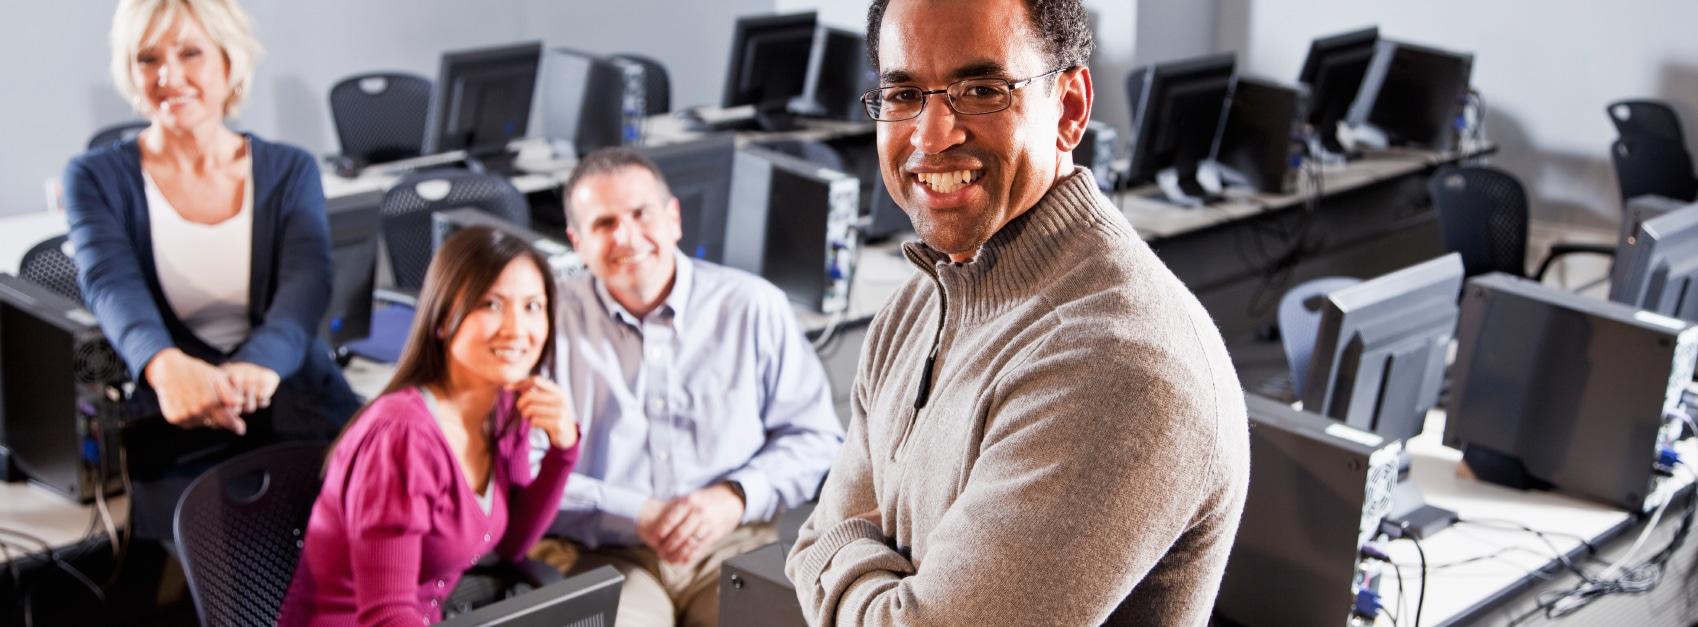 Prozesse an Hochschulen - Personen im Seminarraum